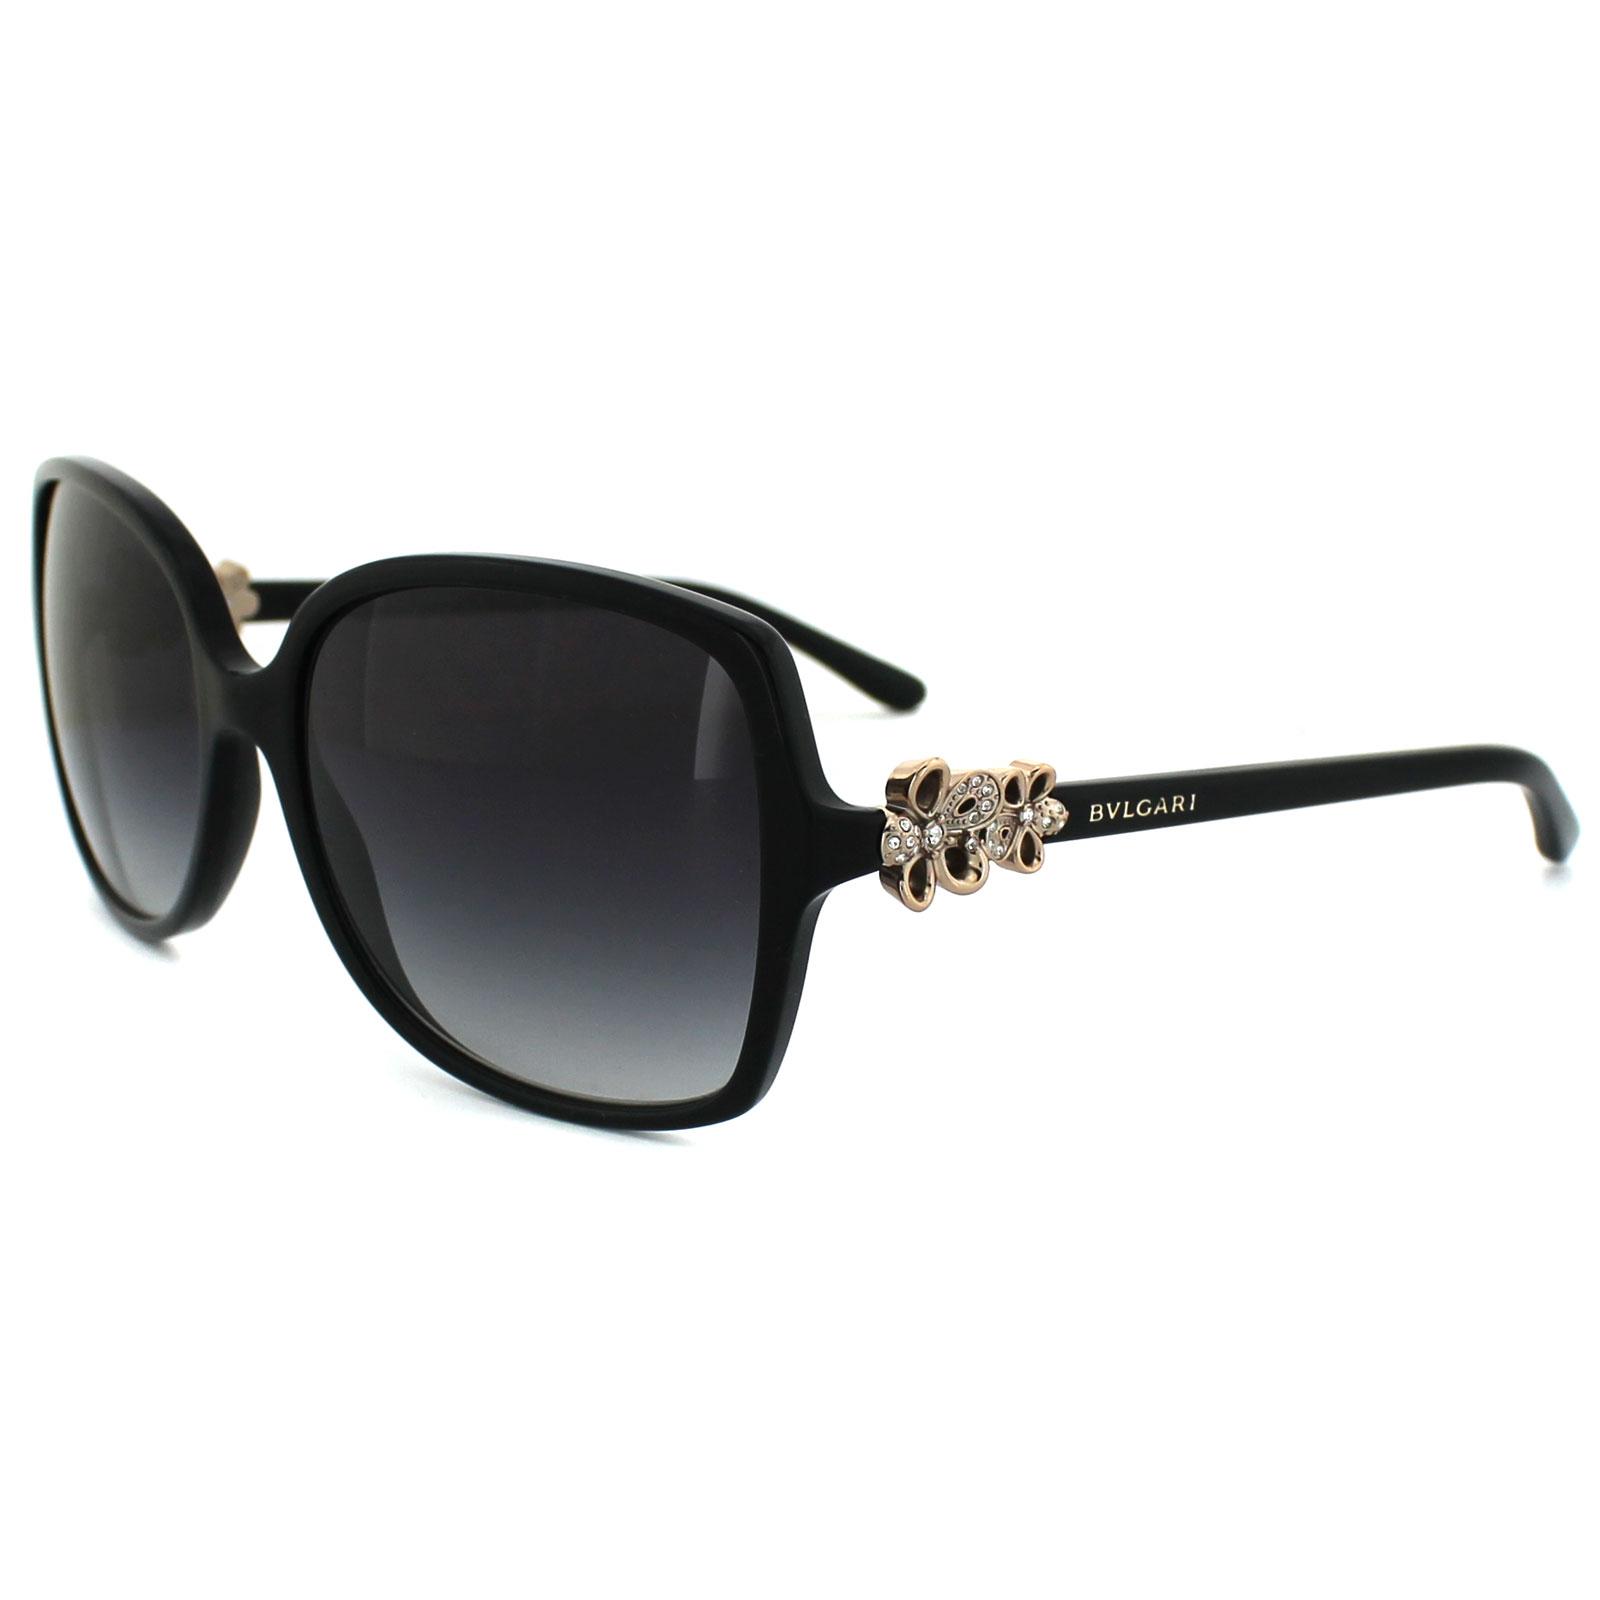 Bvlgari Sunglasses 8120B 501/8G Black Grey Gradient 8053672080650 | eBay